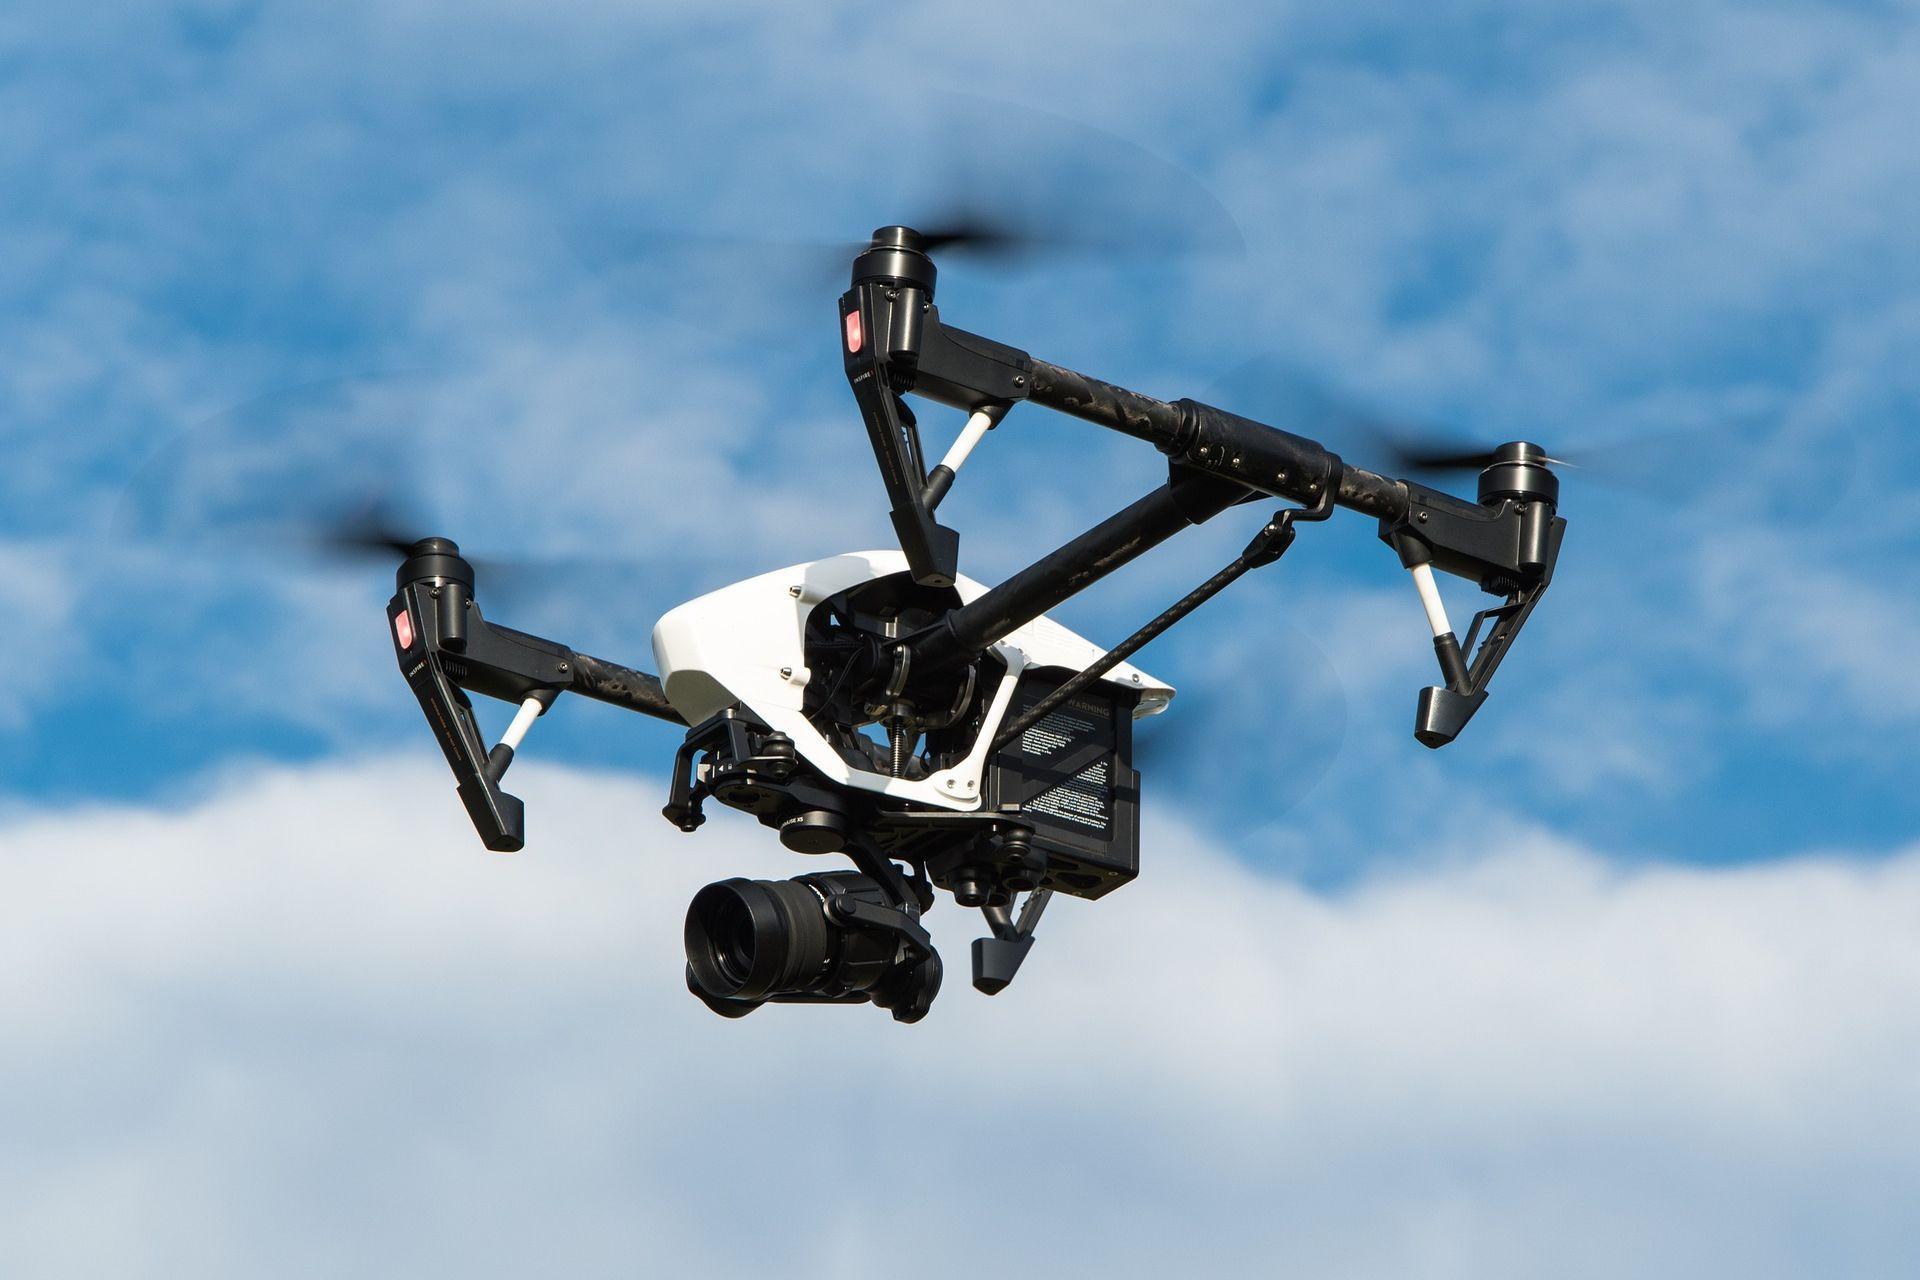 Drohne Test : Drohne für Profis